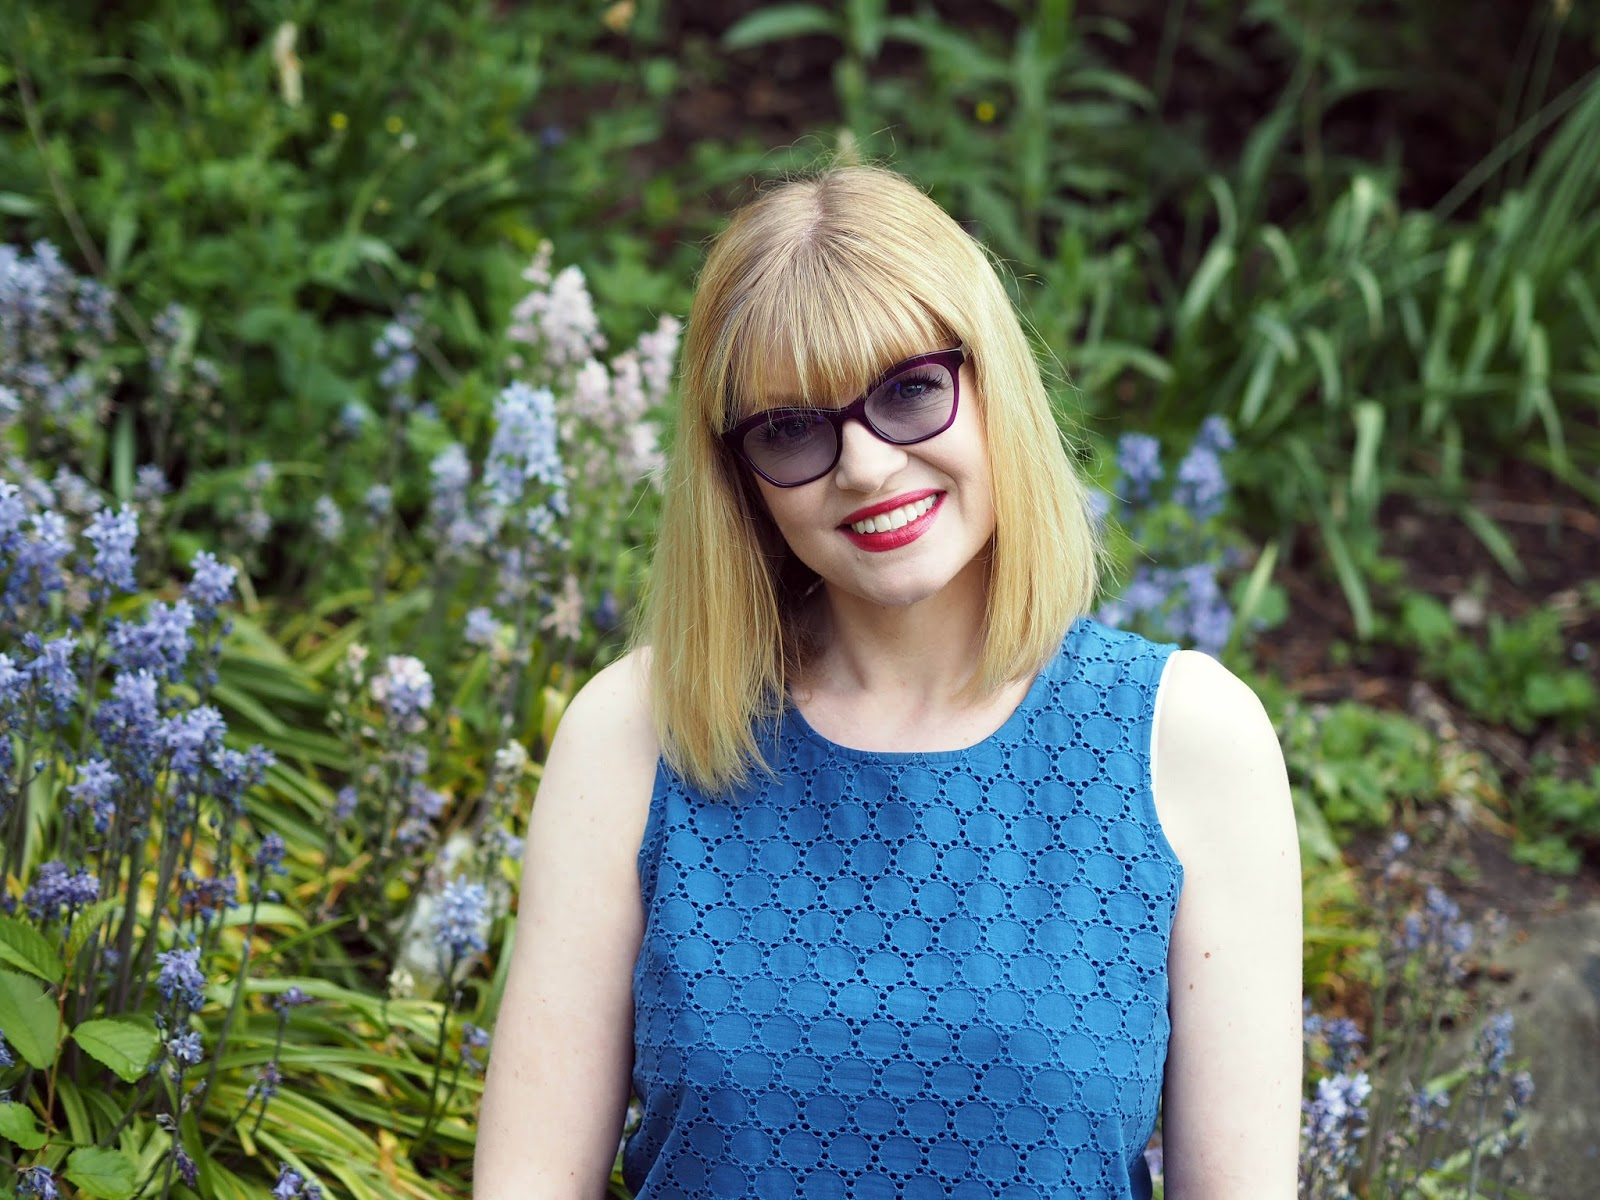 What-Lizzy-Loves-wearing-purple-Caroline-Abram-frames-Style-Colours-photochromic-lsunglasses-lenses-sapphire-blue